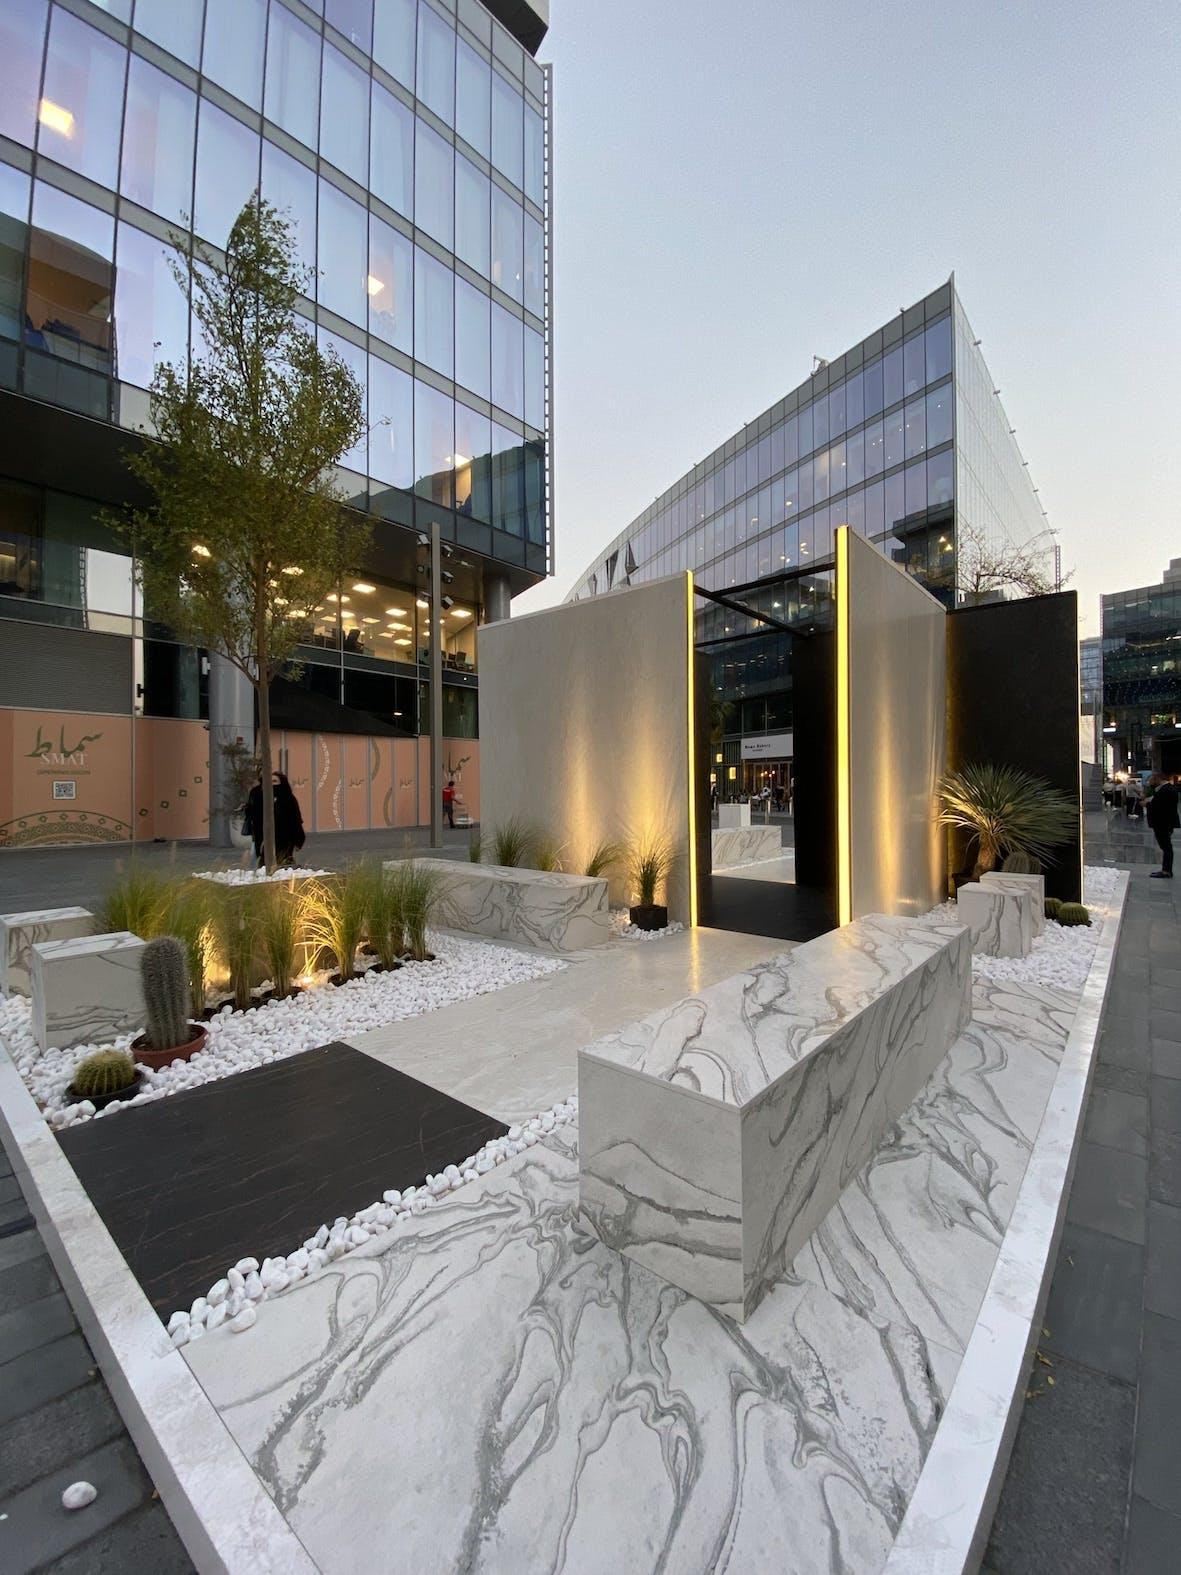 Image of Pardis DektonbyCosentino DDW 2020 3 1 in Cosentino presents 'Pardis' at Dubai Design Week 2020 - Cosentino